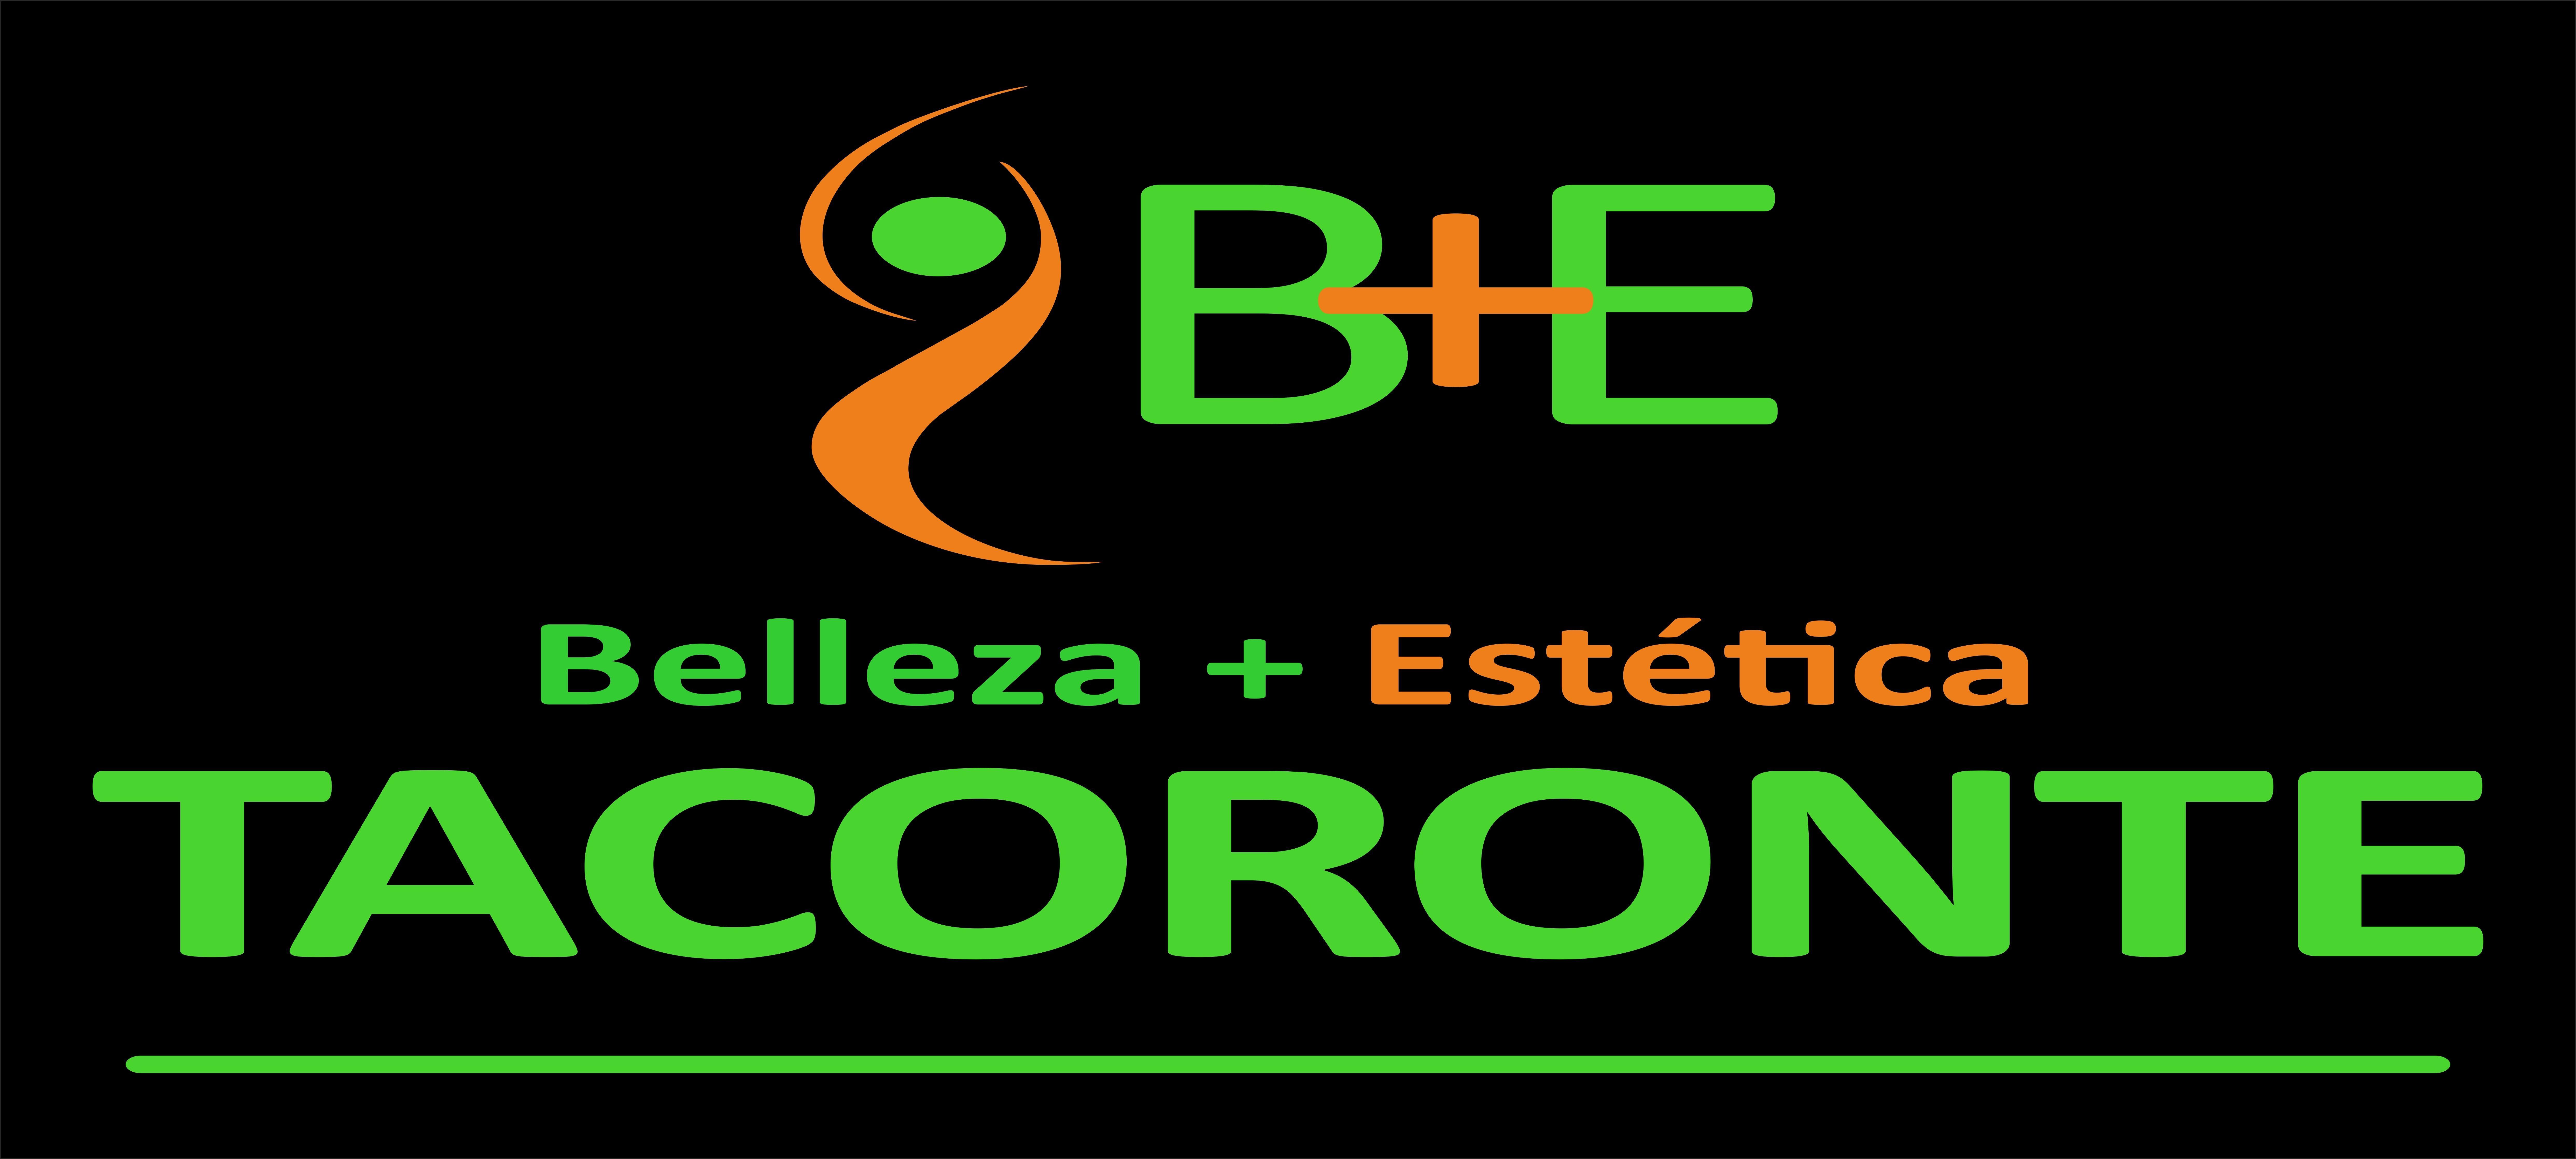 Foto 1 de Belleza en Tacoronte | Belleza+Estética Tacoronte